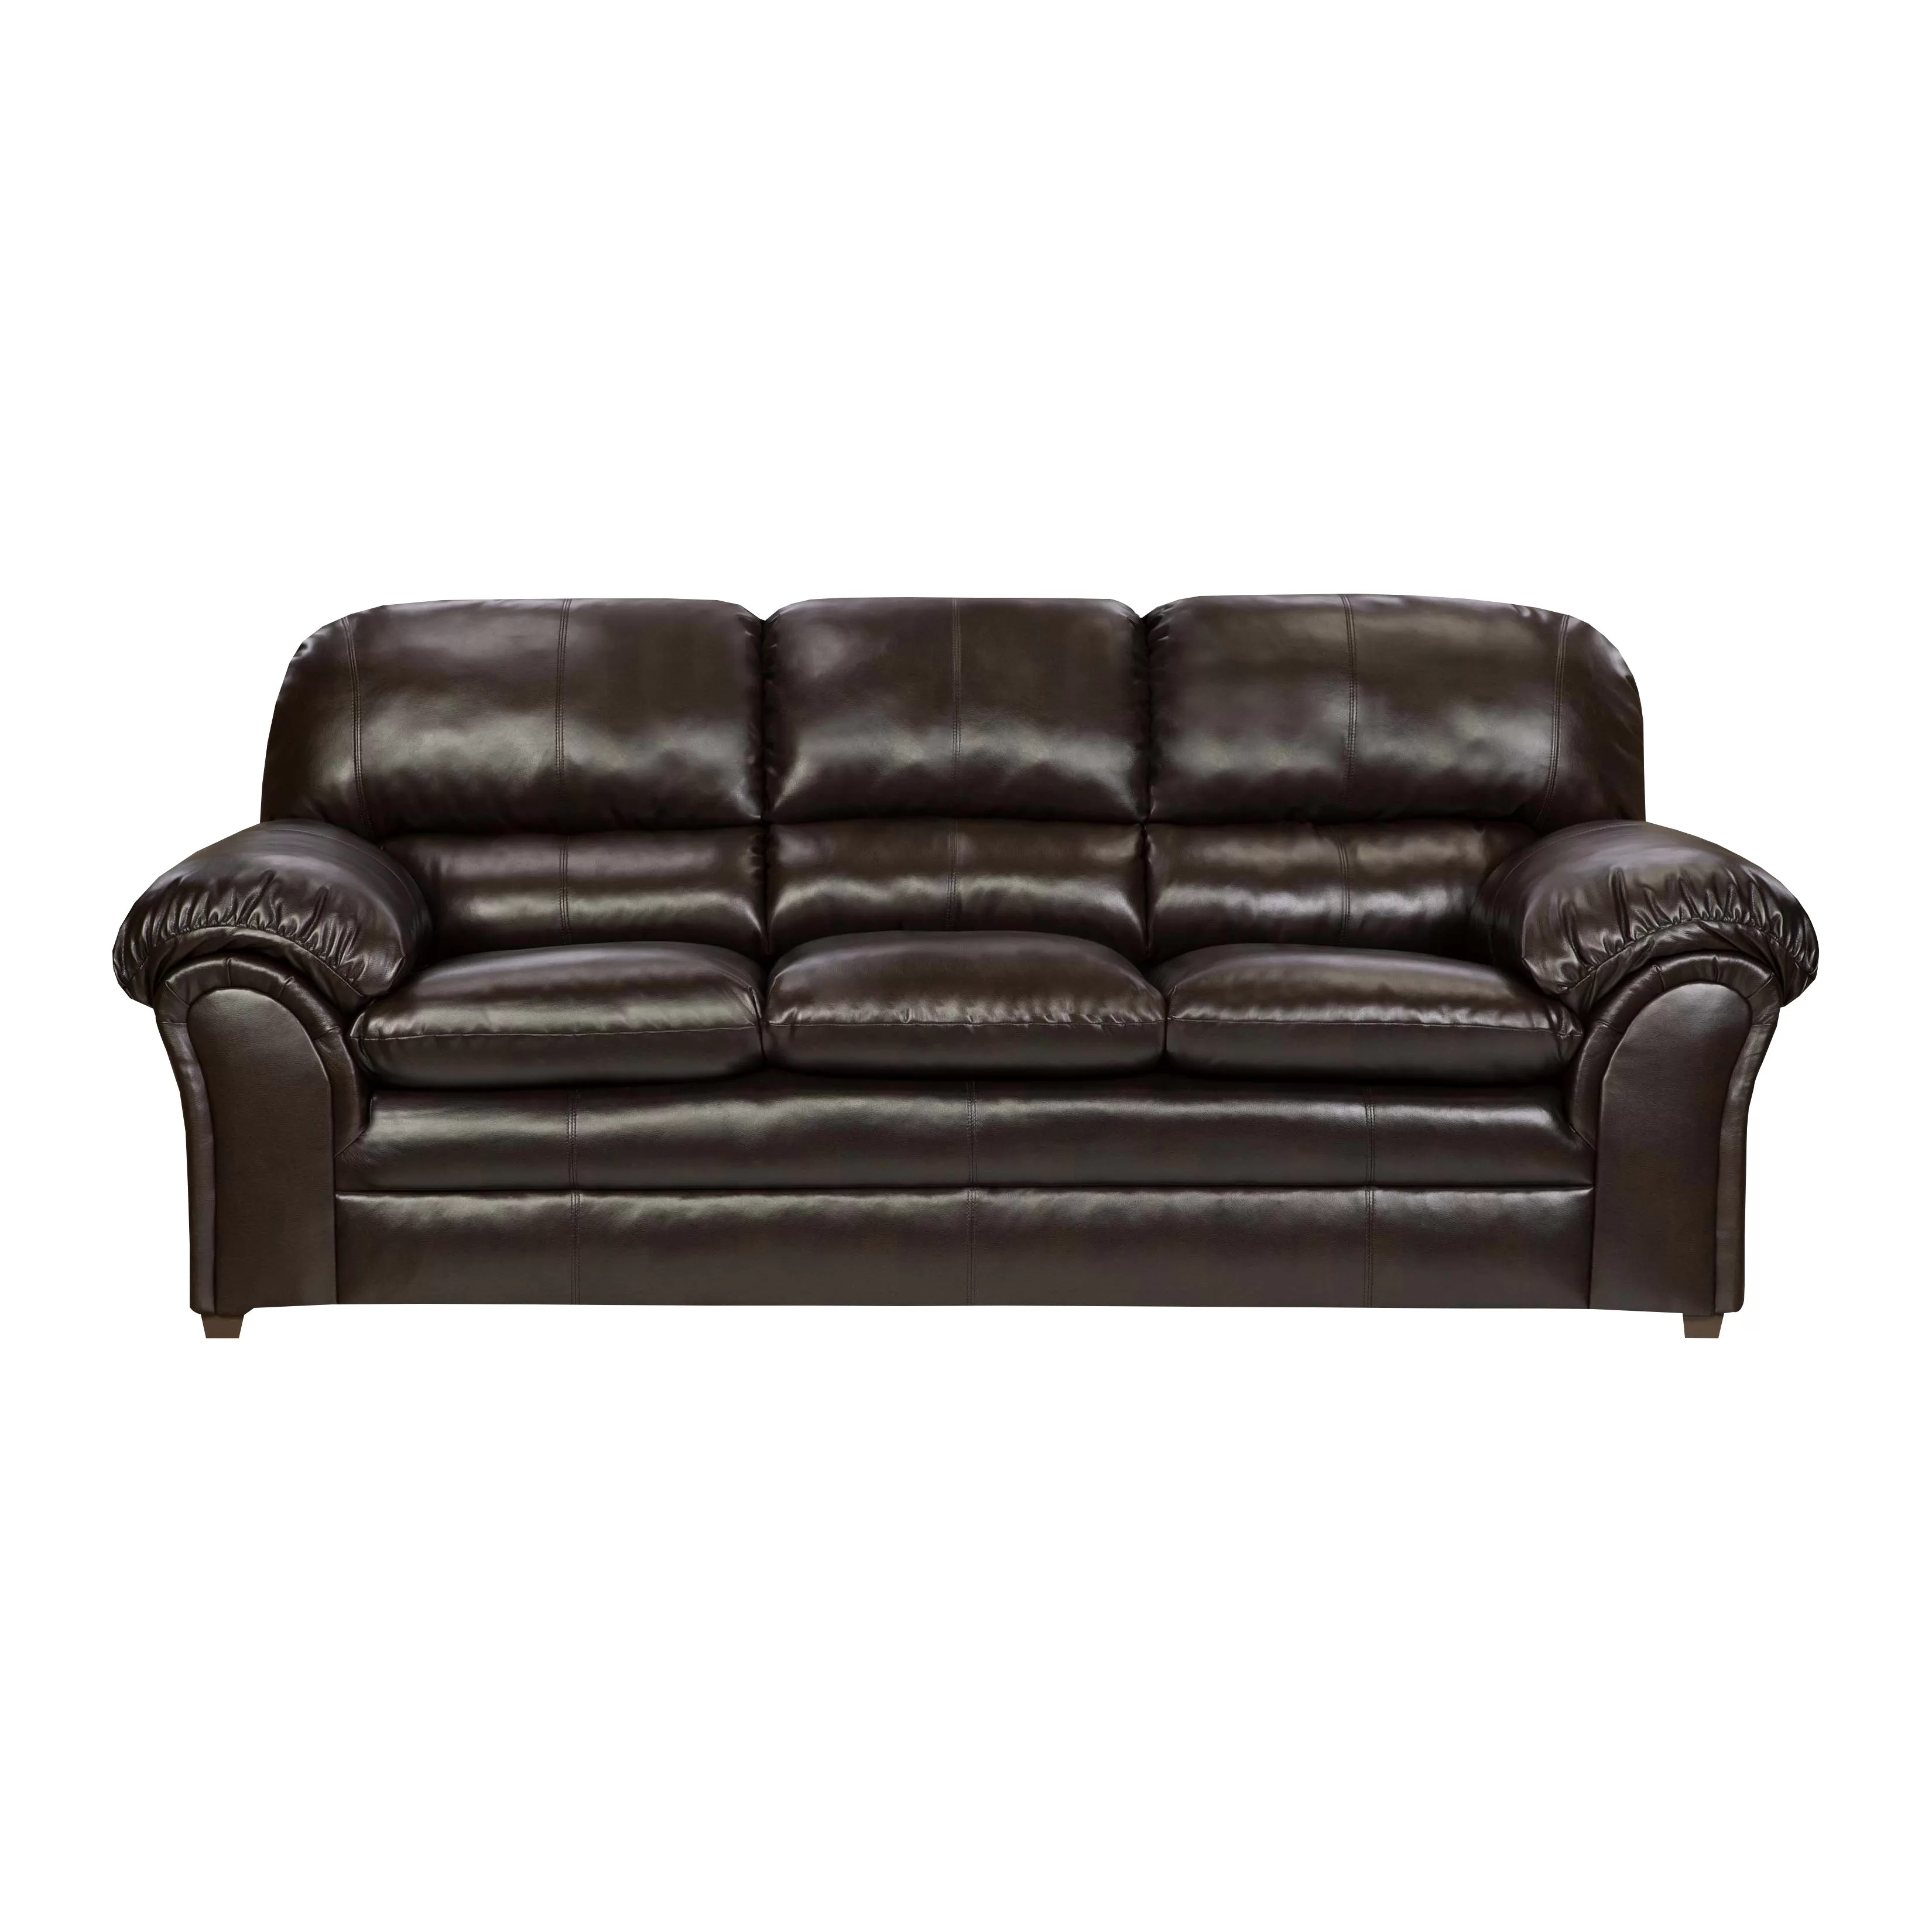 Simmons Upholstery Riverside Sofa & Reviews